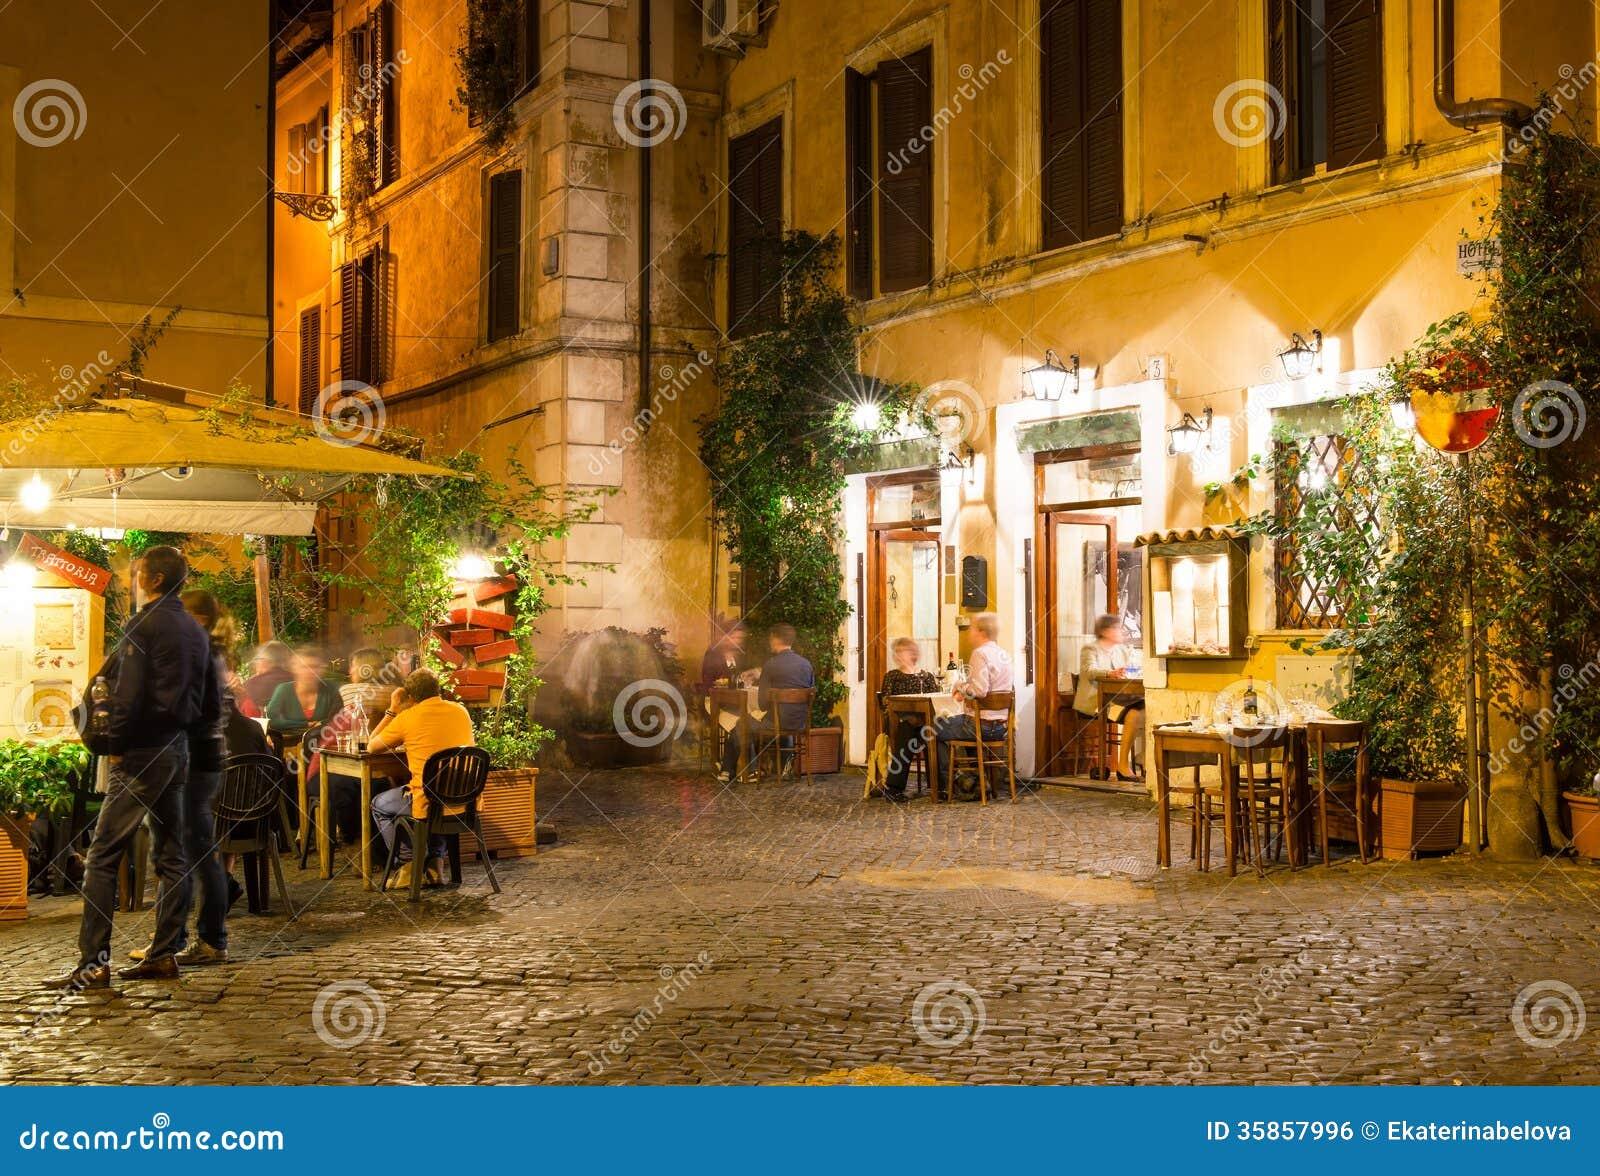 Italian House Plans Old Street In Trastevere In Rome Royalty Free Stock Image